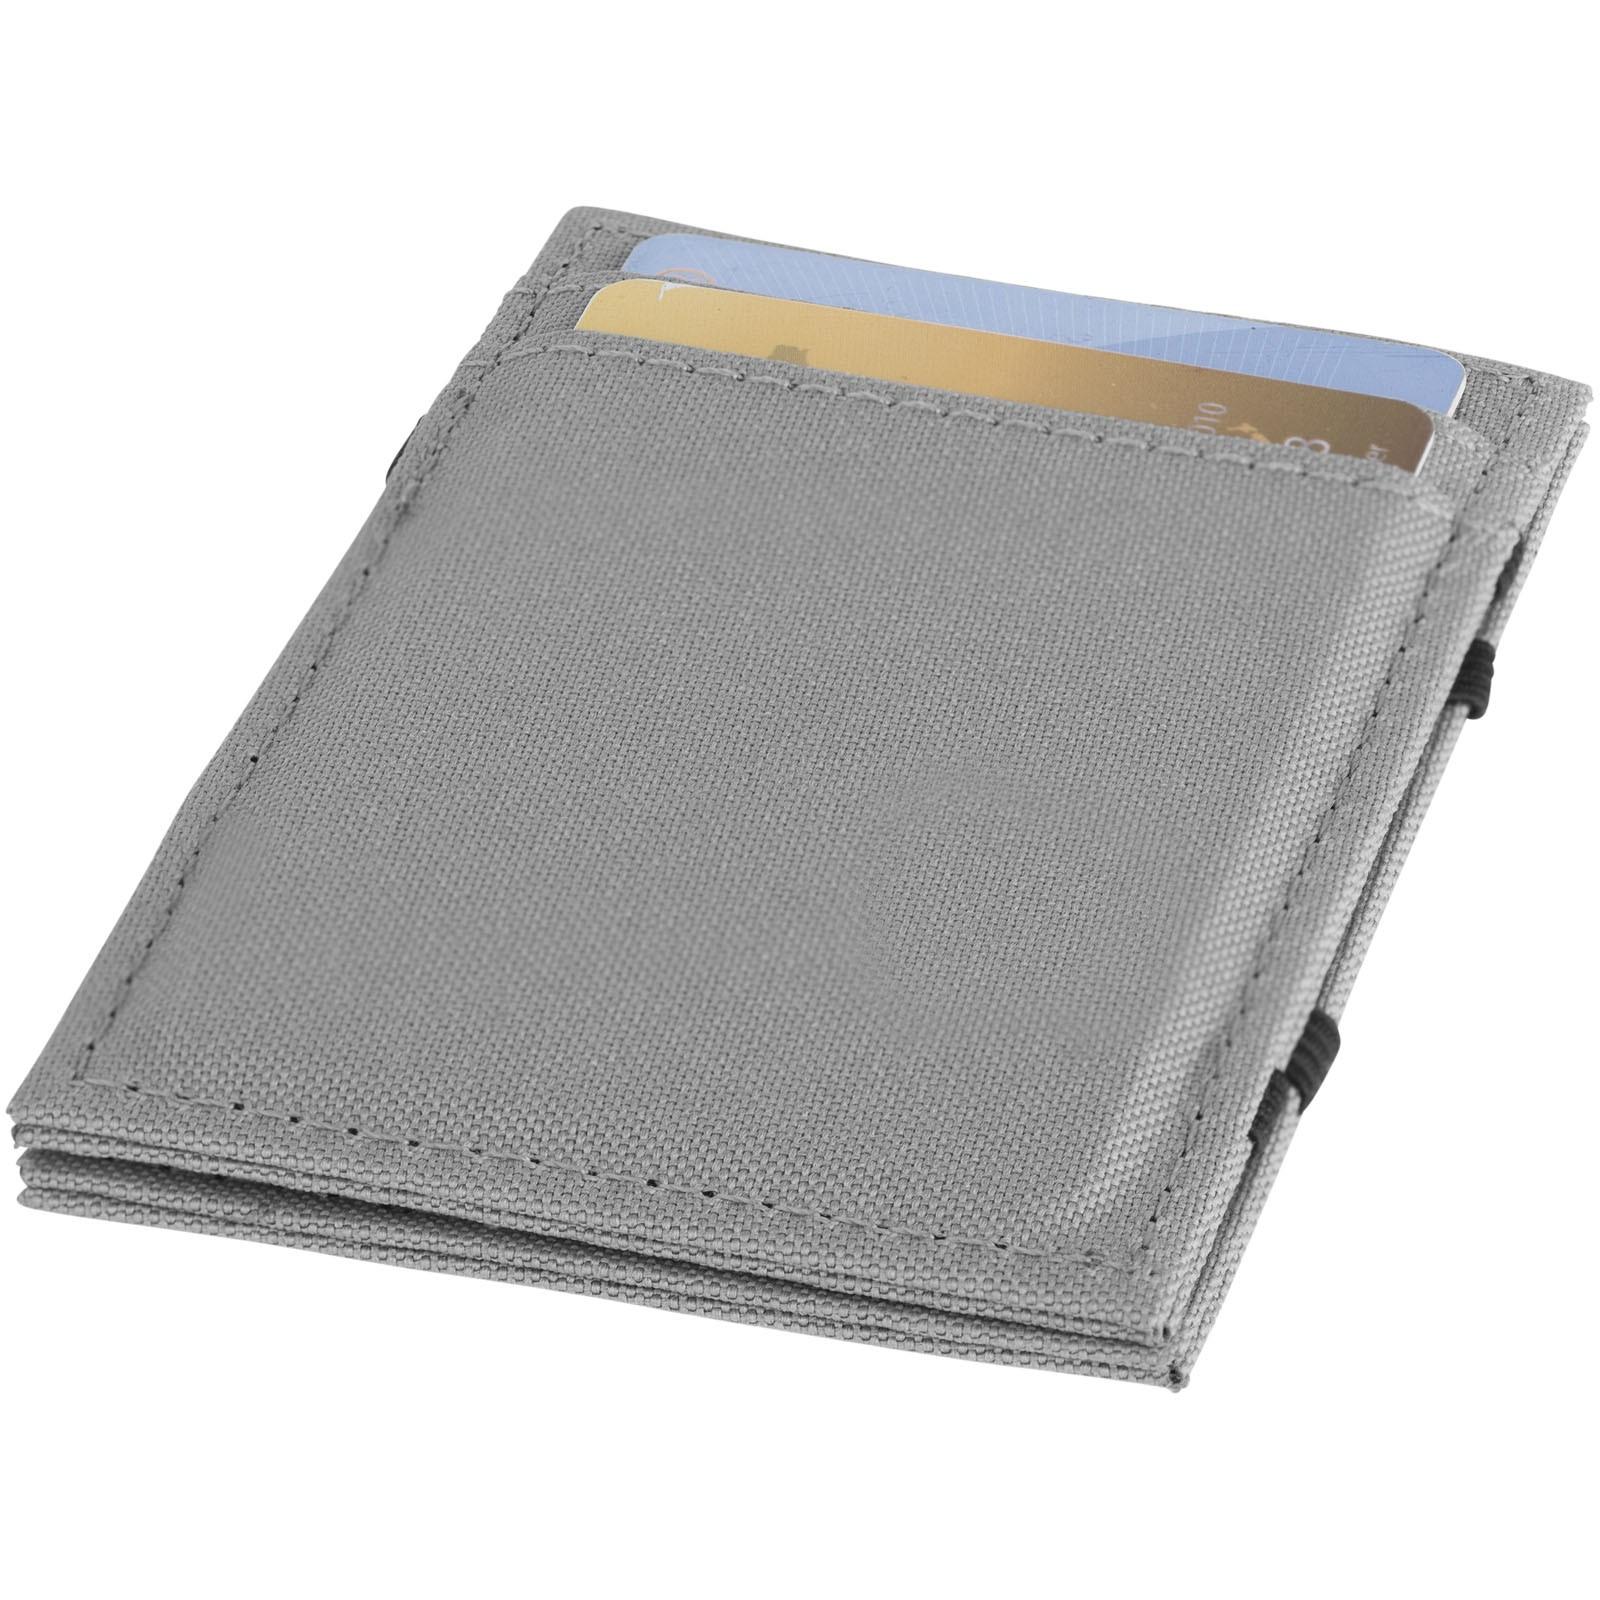 Adventurer RFID vyklápěcí peněženka - Šedá